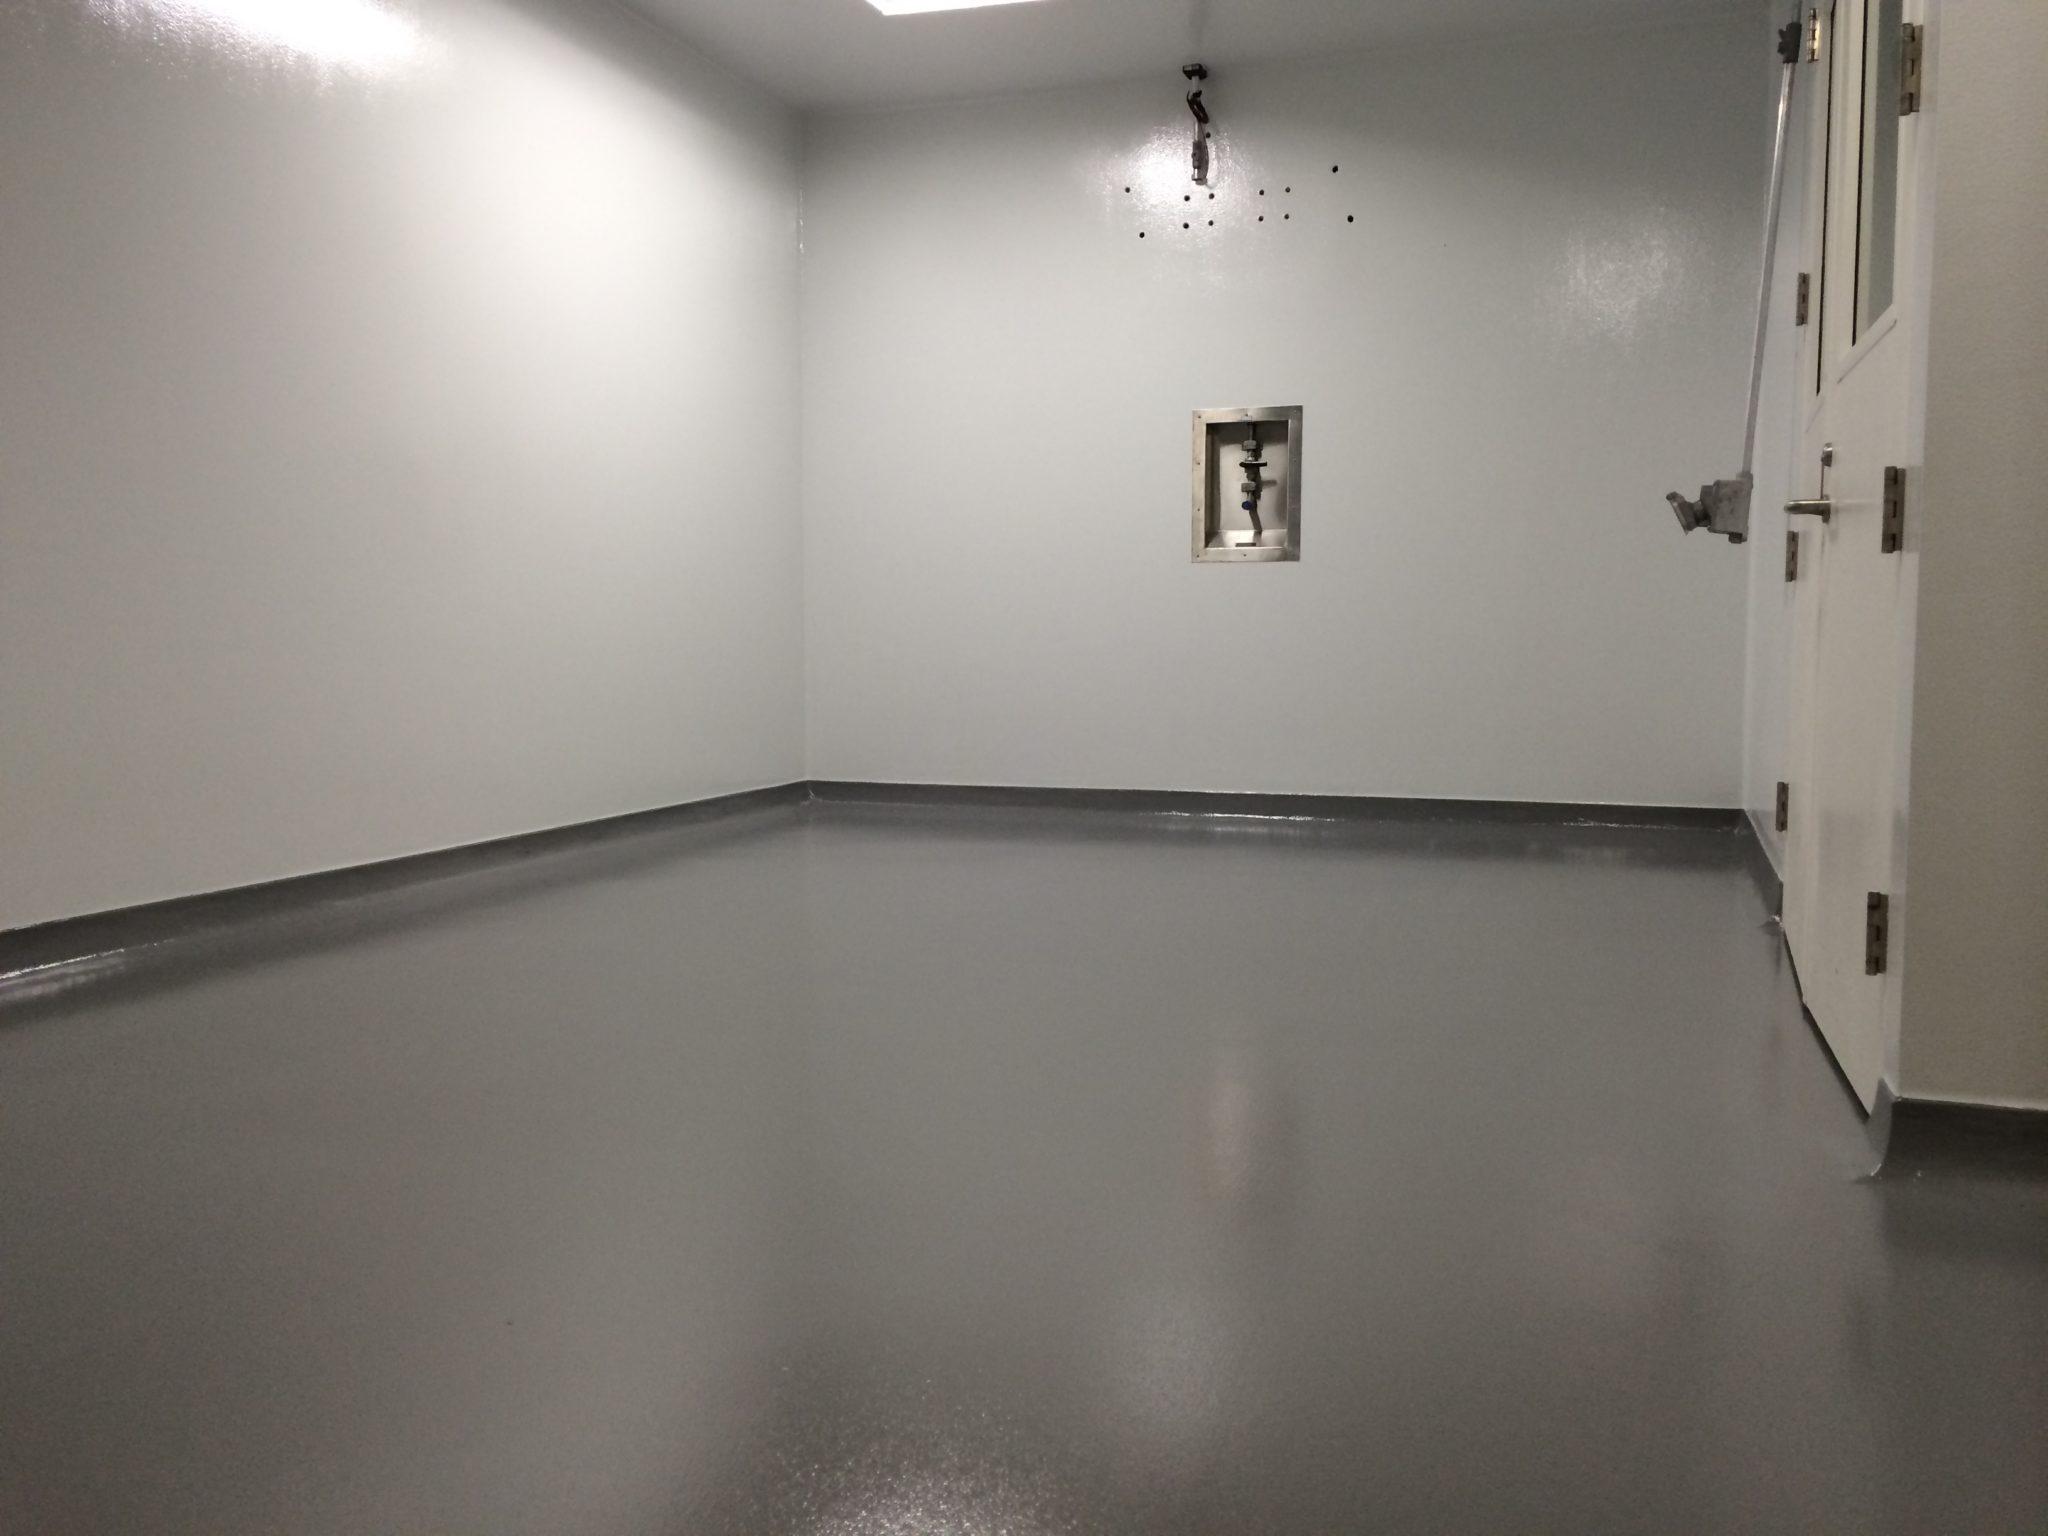 Cover Clad Ti U S Flooring Company